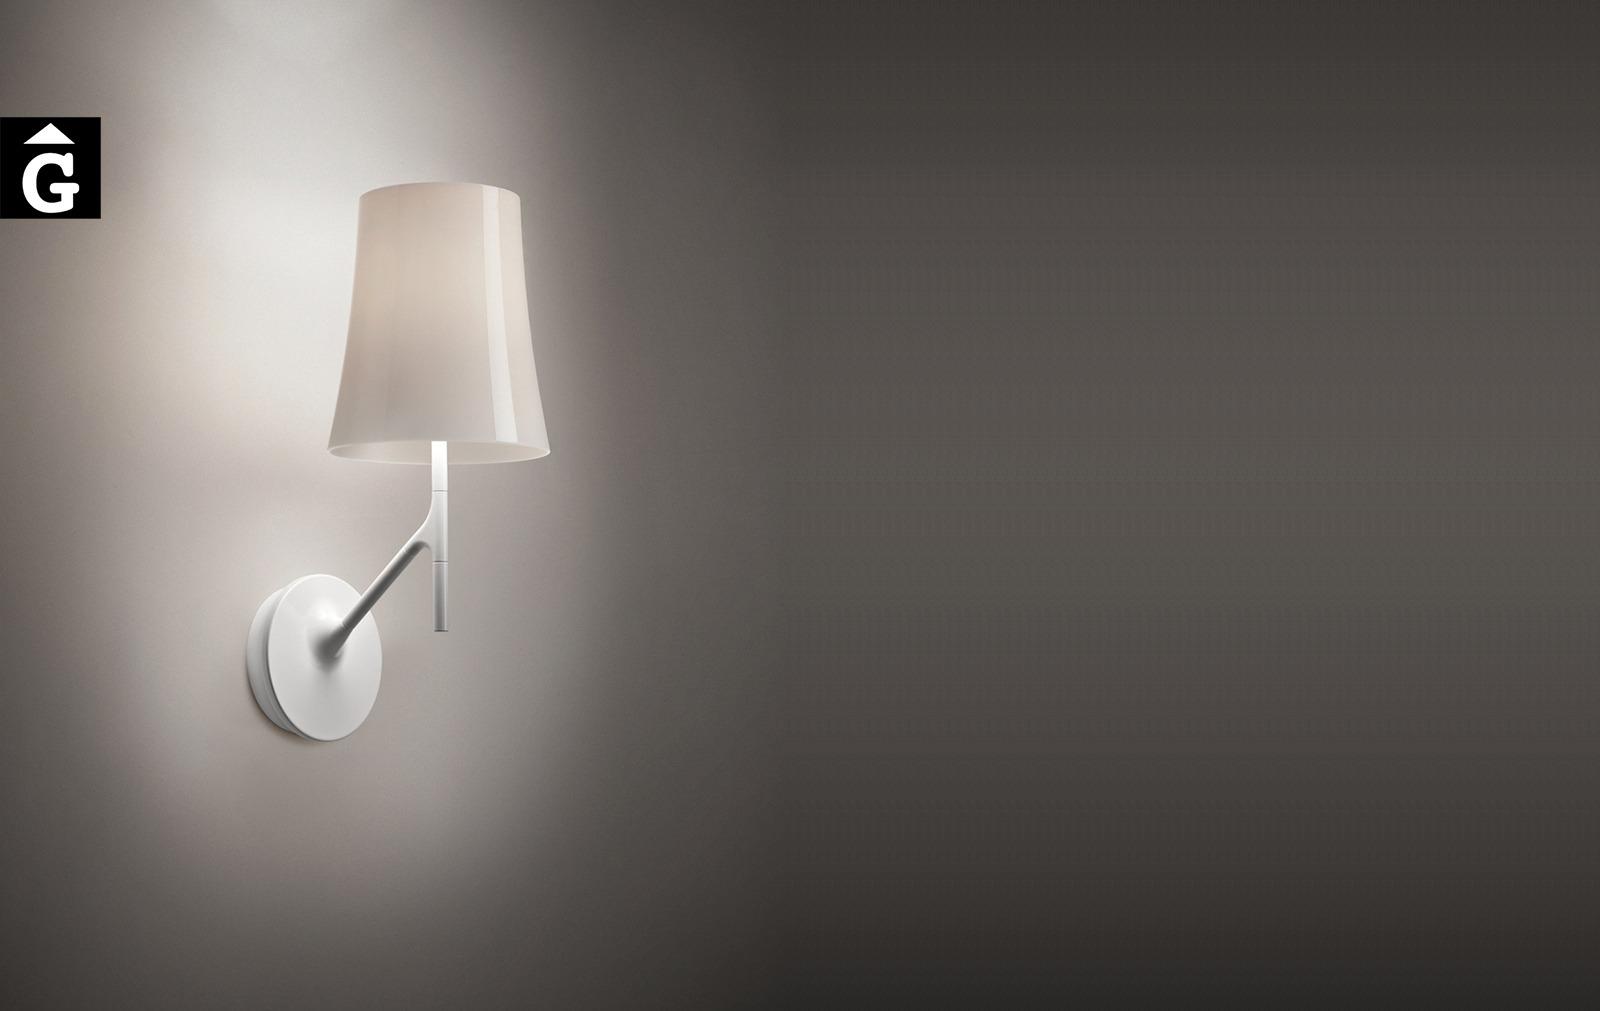 Làmpada aplic blanc Birdie | Lampares foscarini | mobles Gifreu